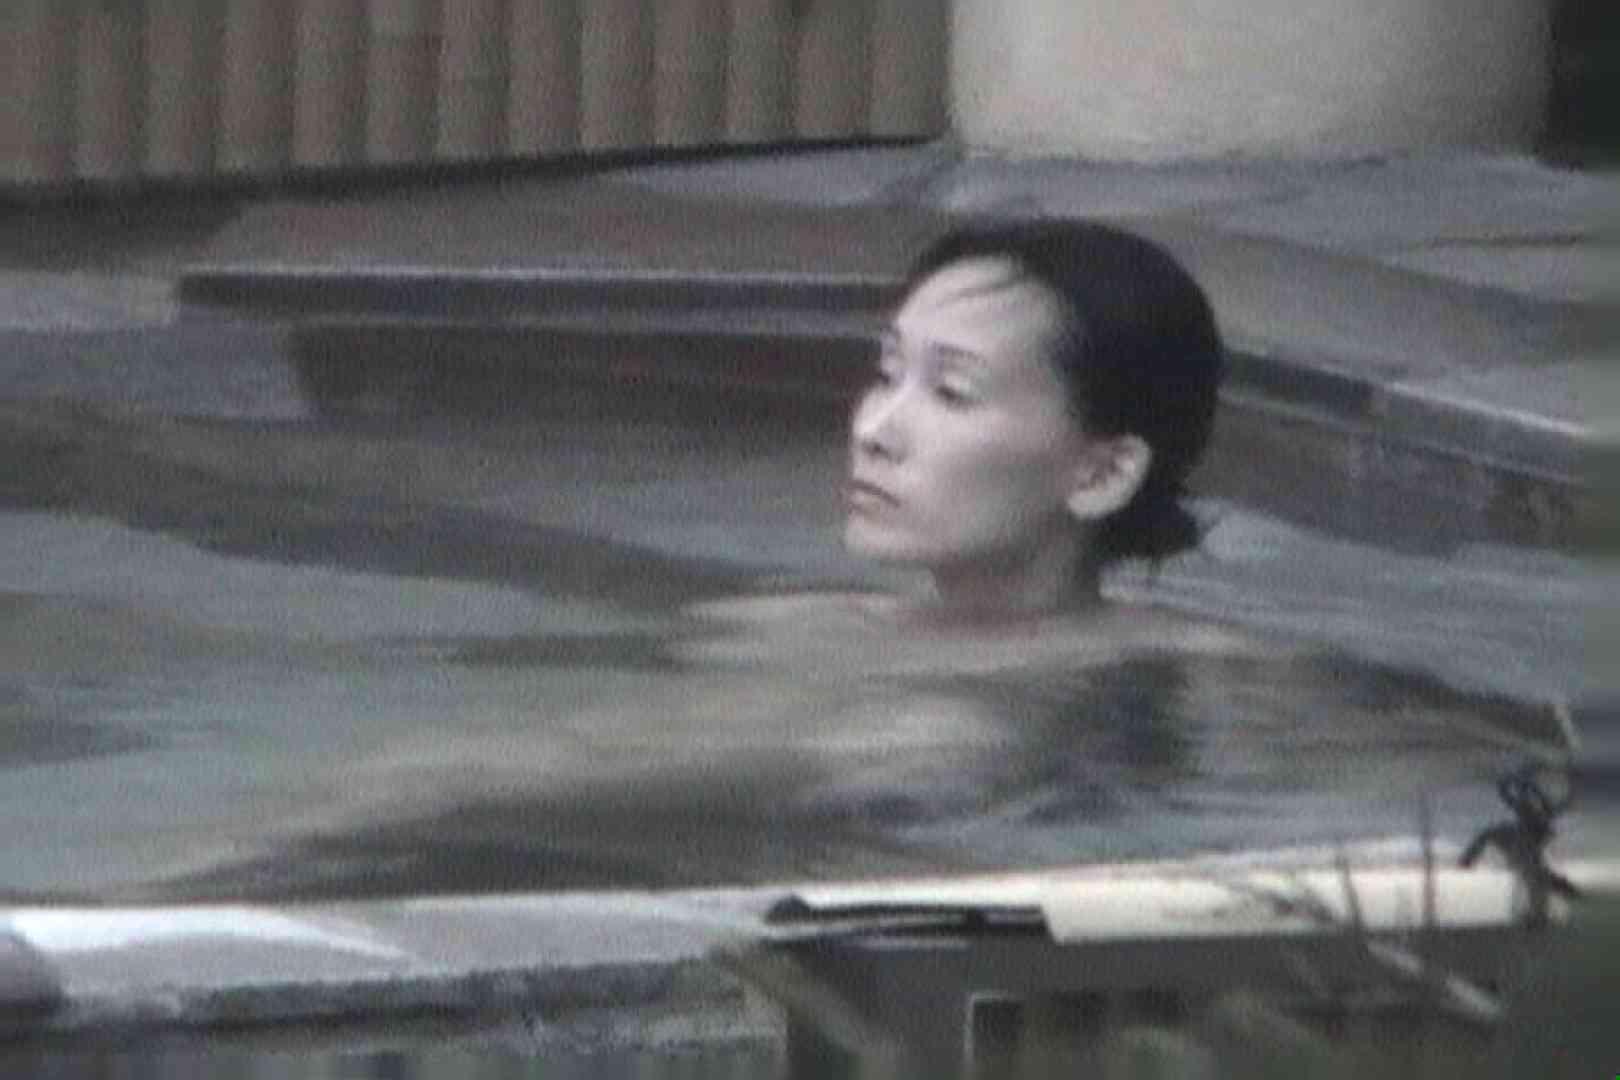 Aquaな露天風呂Vol.557 露天 | OL女体  40連発 4